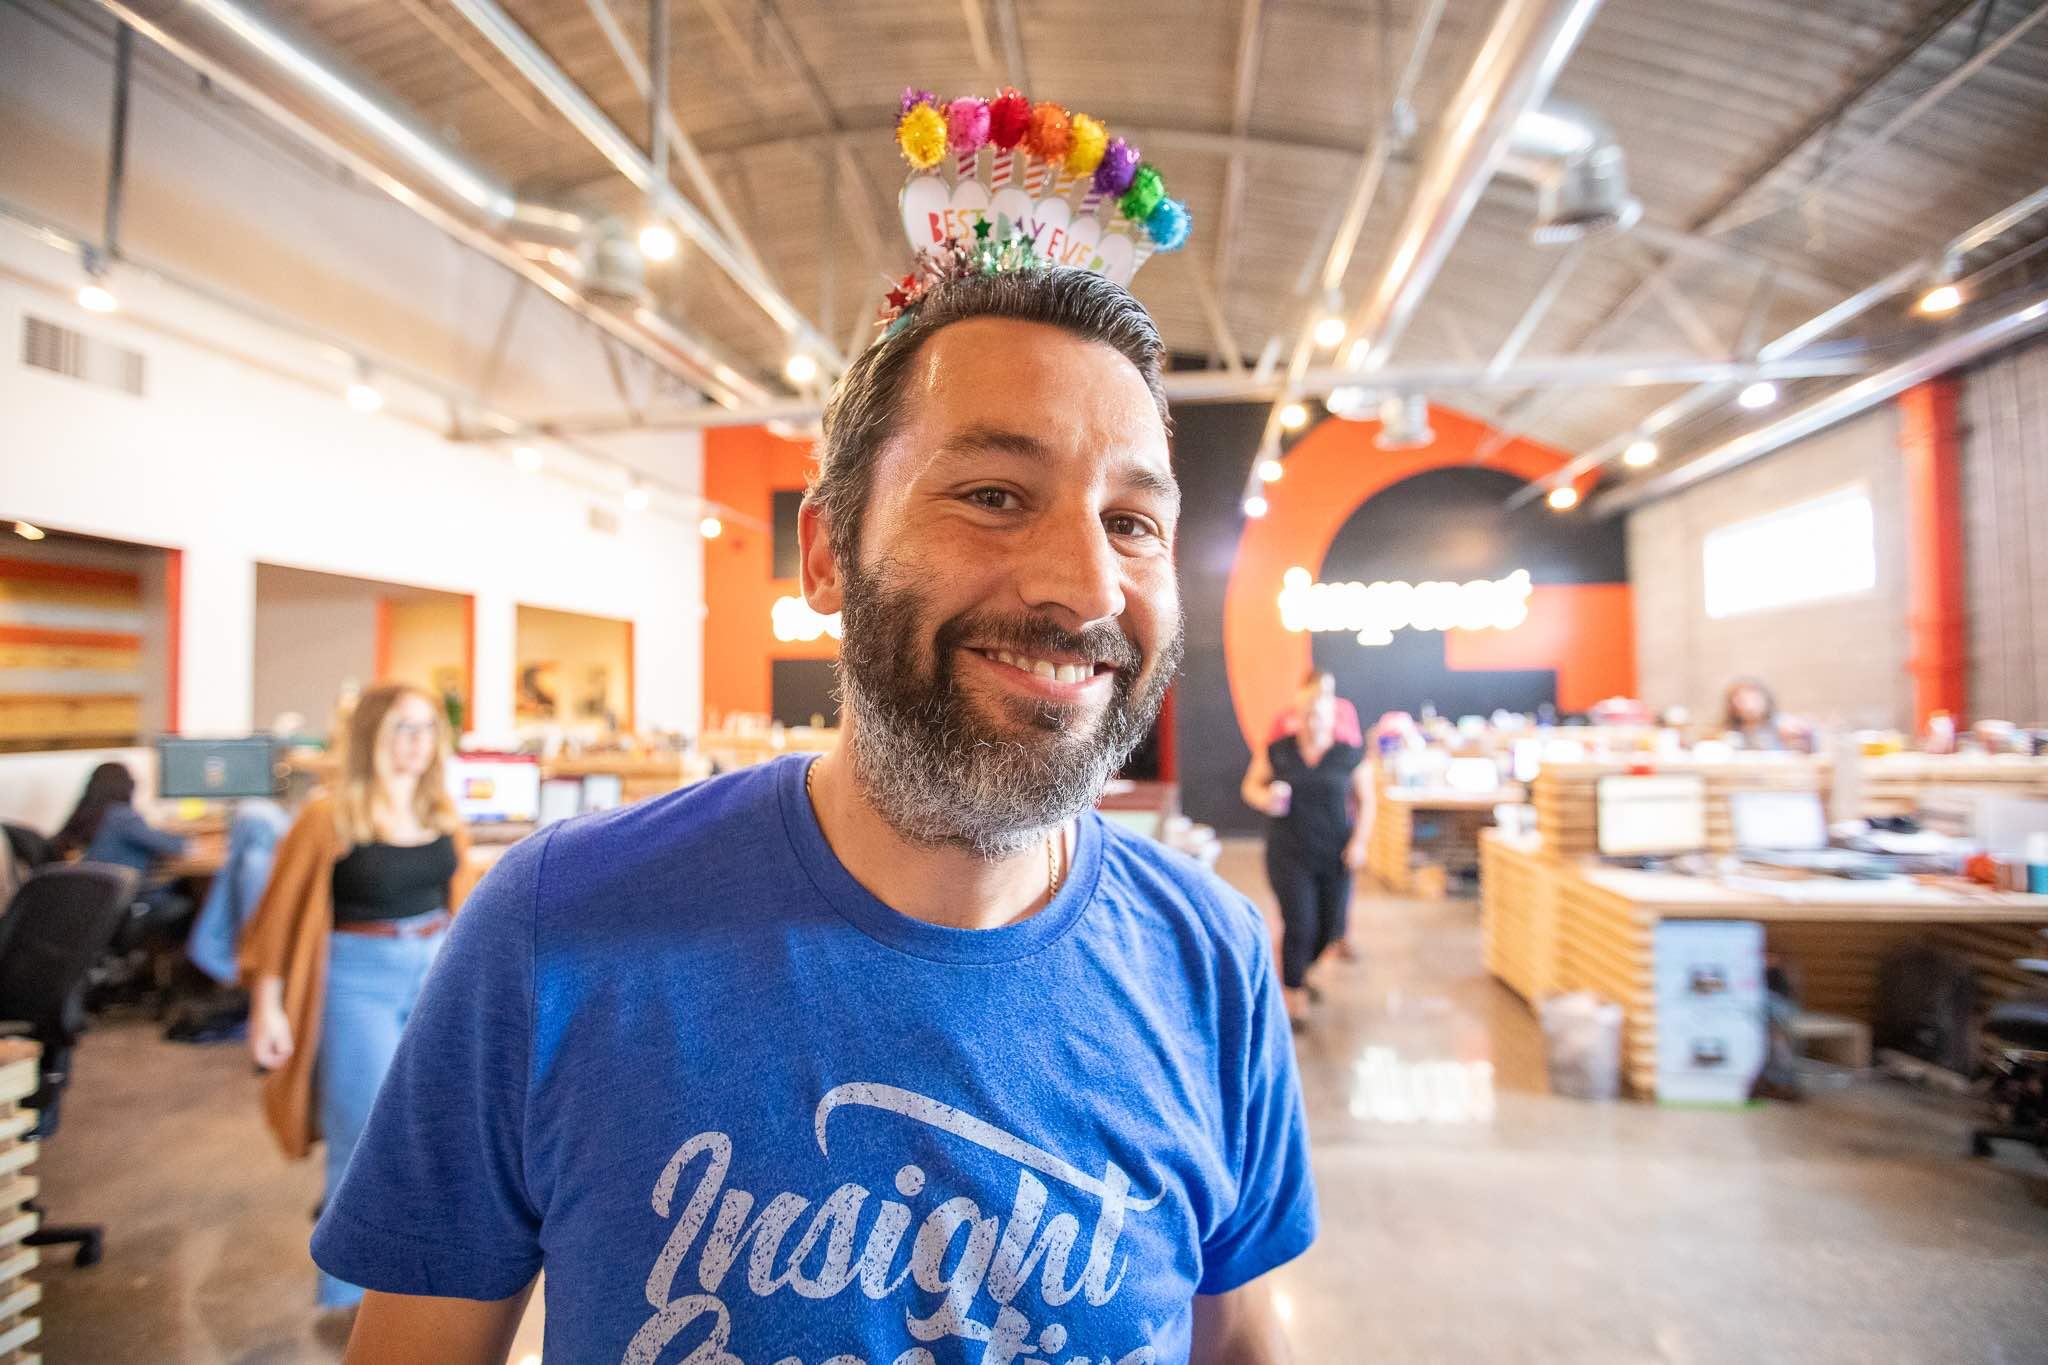 Scott Kubes has a birthday at ICG